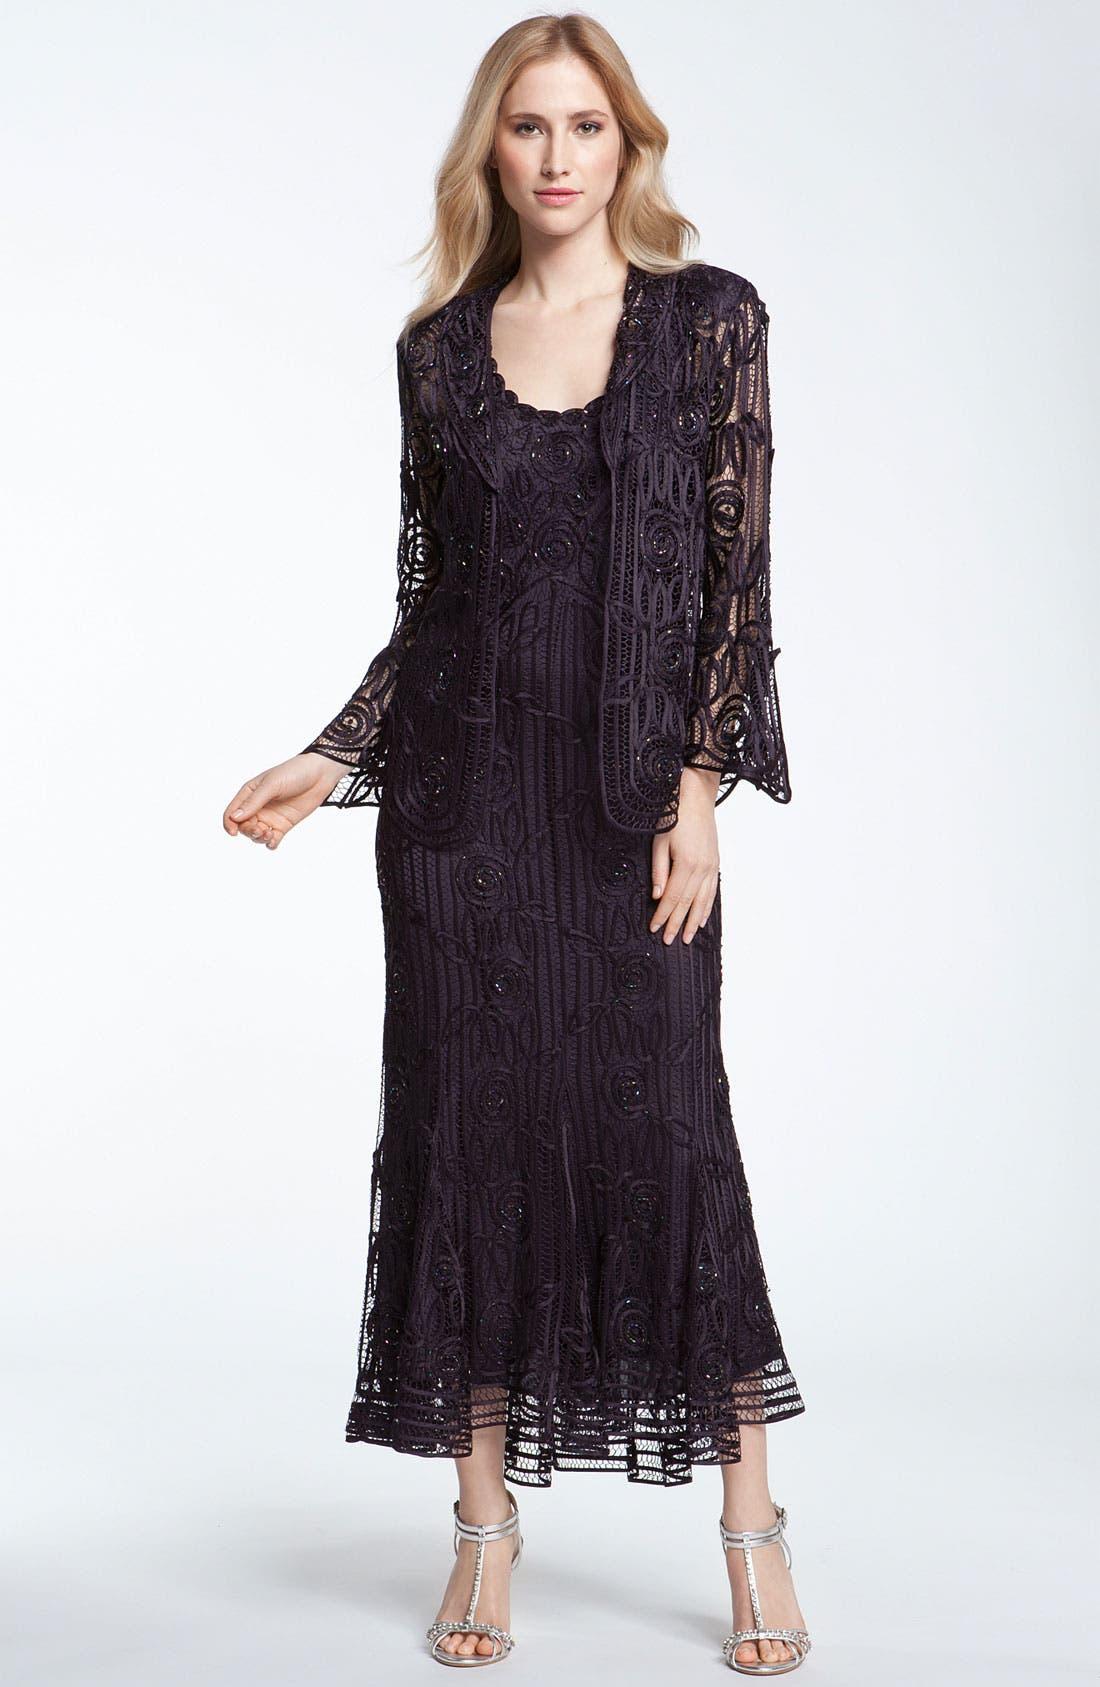 Main Image - Soulmates Bead Crochet Dress & Jacket